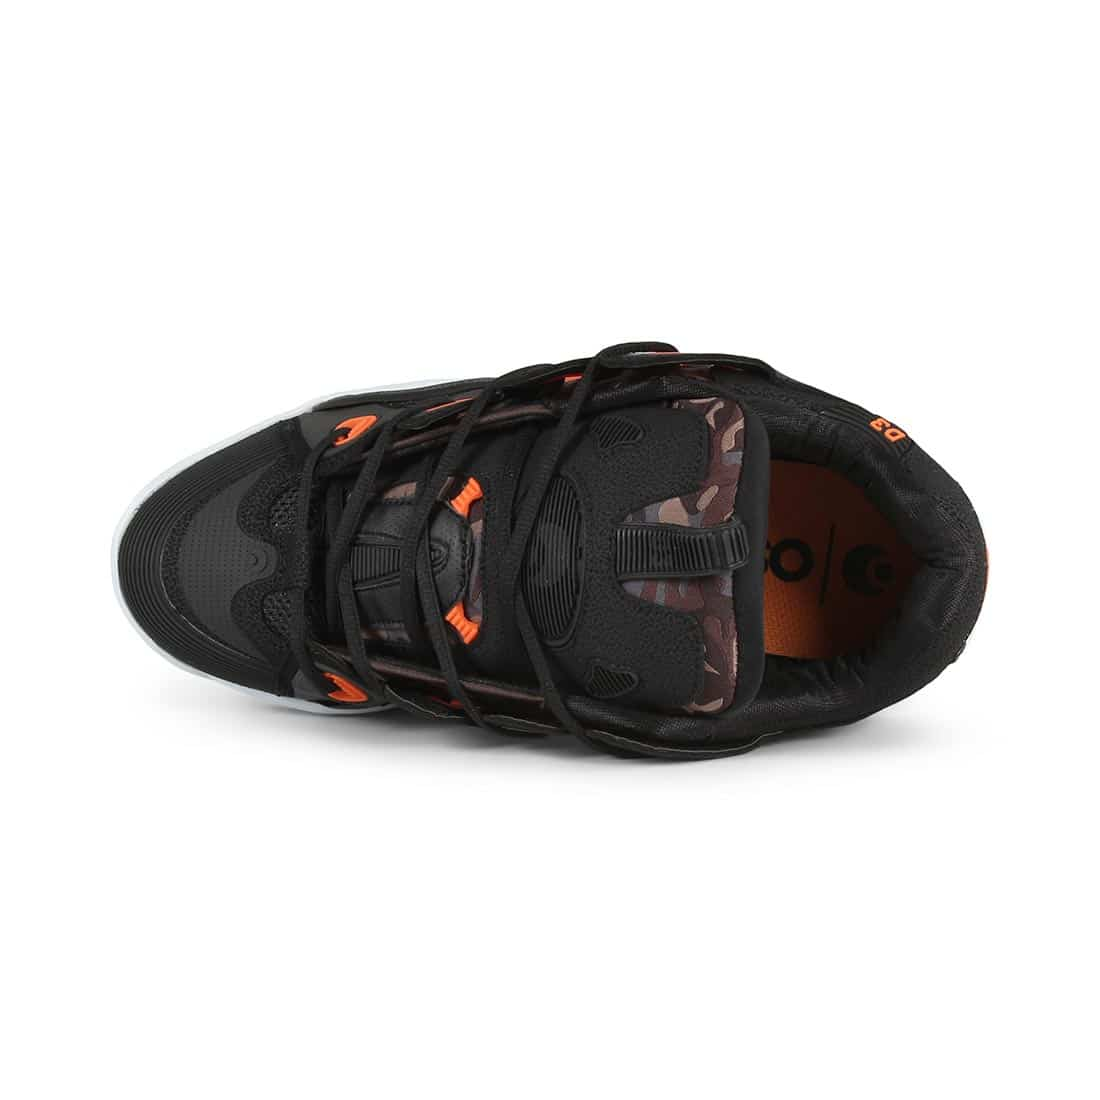 Osiris D3 2001 Shoes - Black / Honor